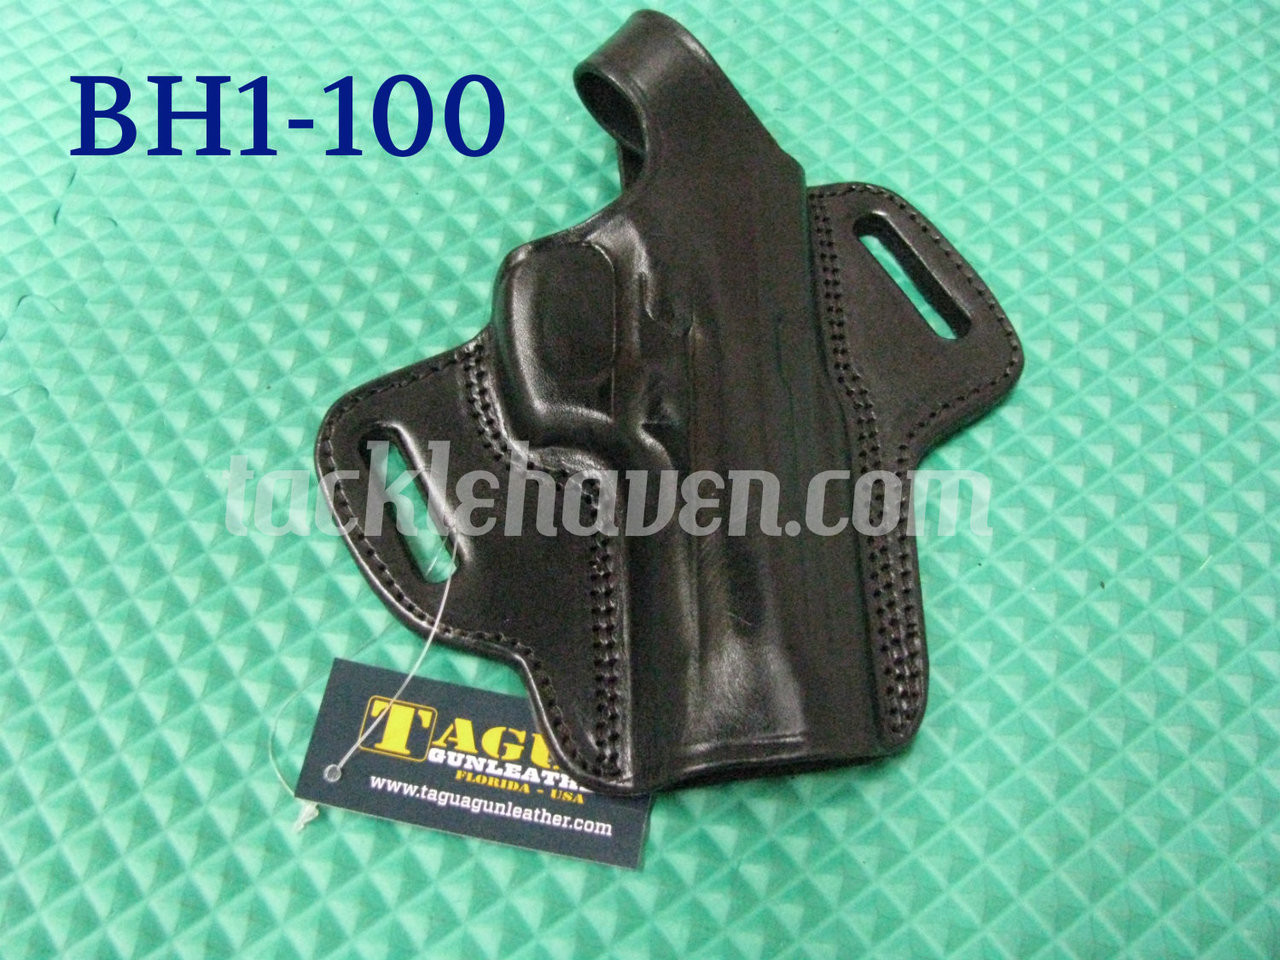 Tagua Thumb Break Belt Holsters #BH1 - Tackle Haven